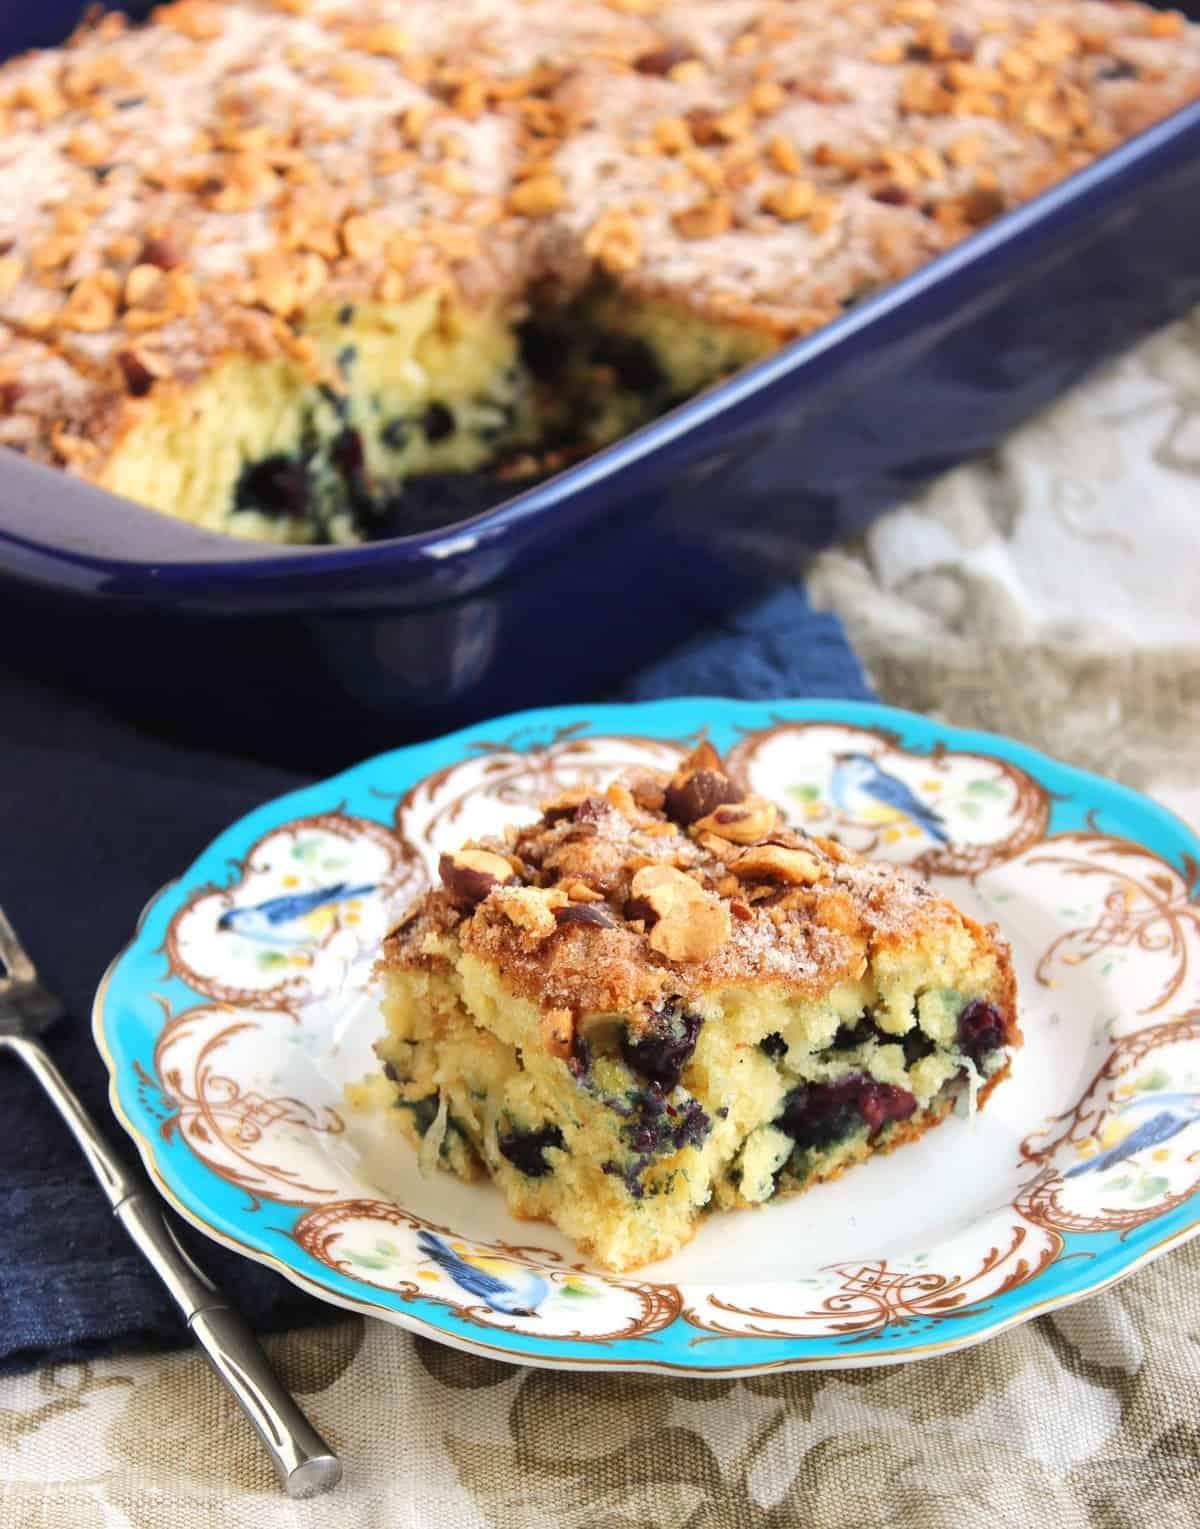 Blueberry coconut yogurt coffee cake and a food blogger cookbook blueberry coconut yogurt coffee cake the suburban soapbox forumfinder Images